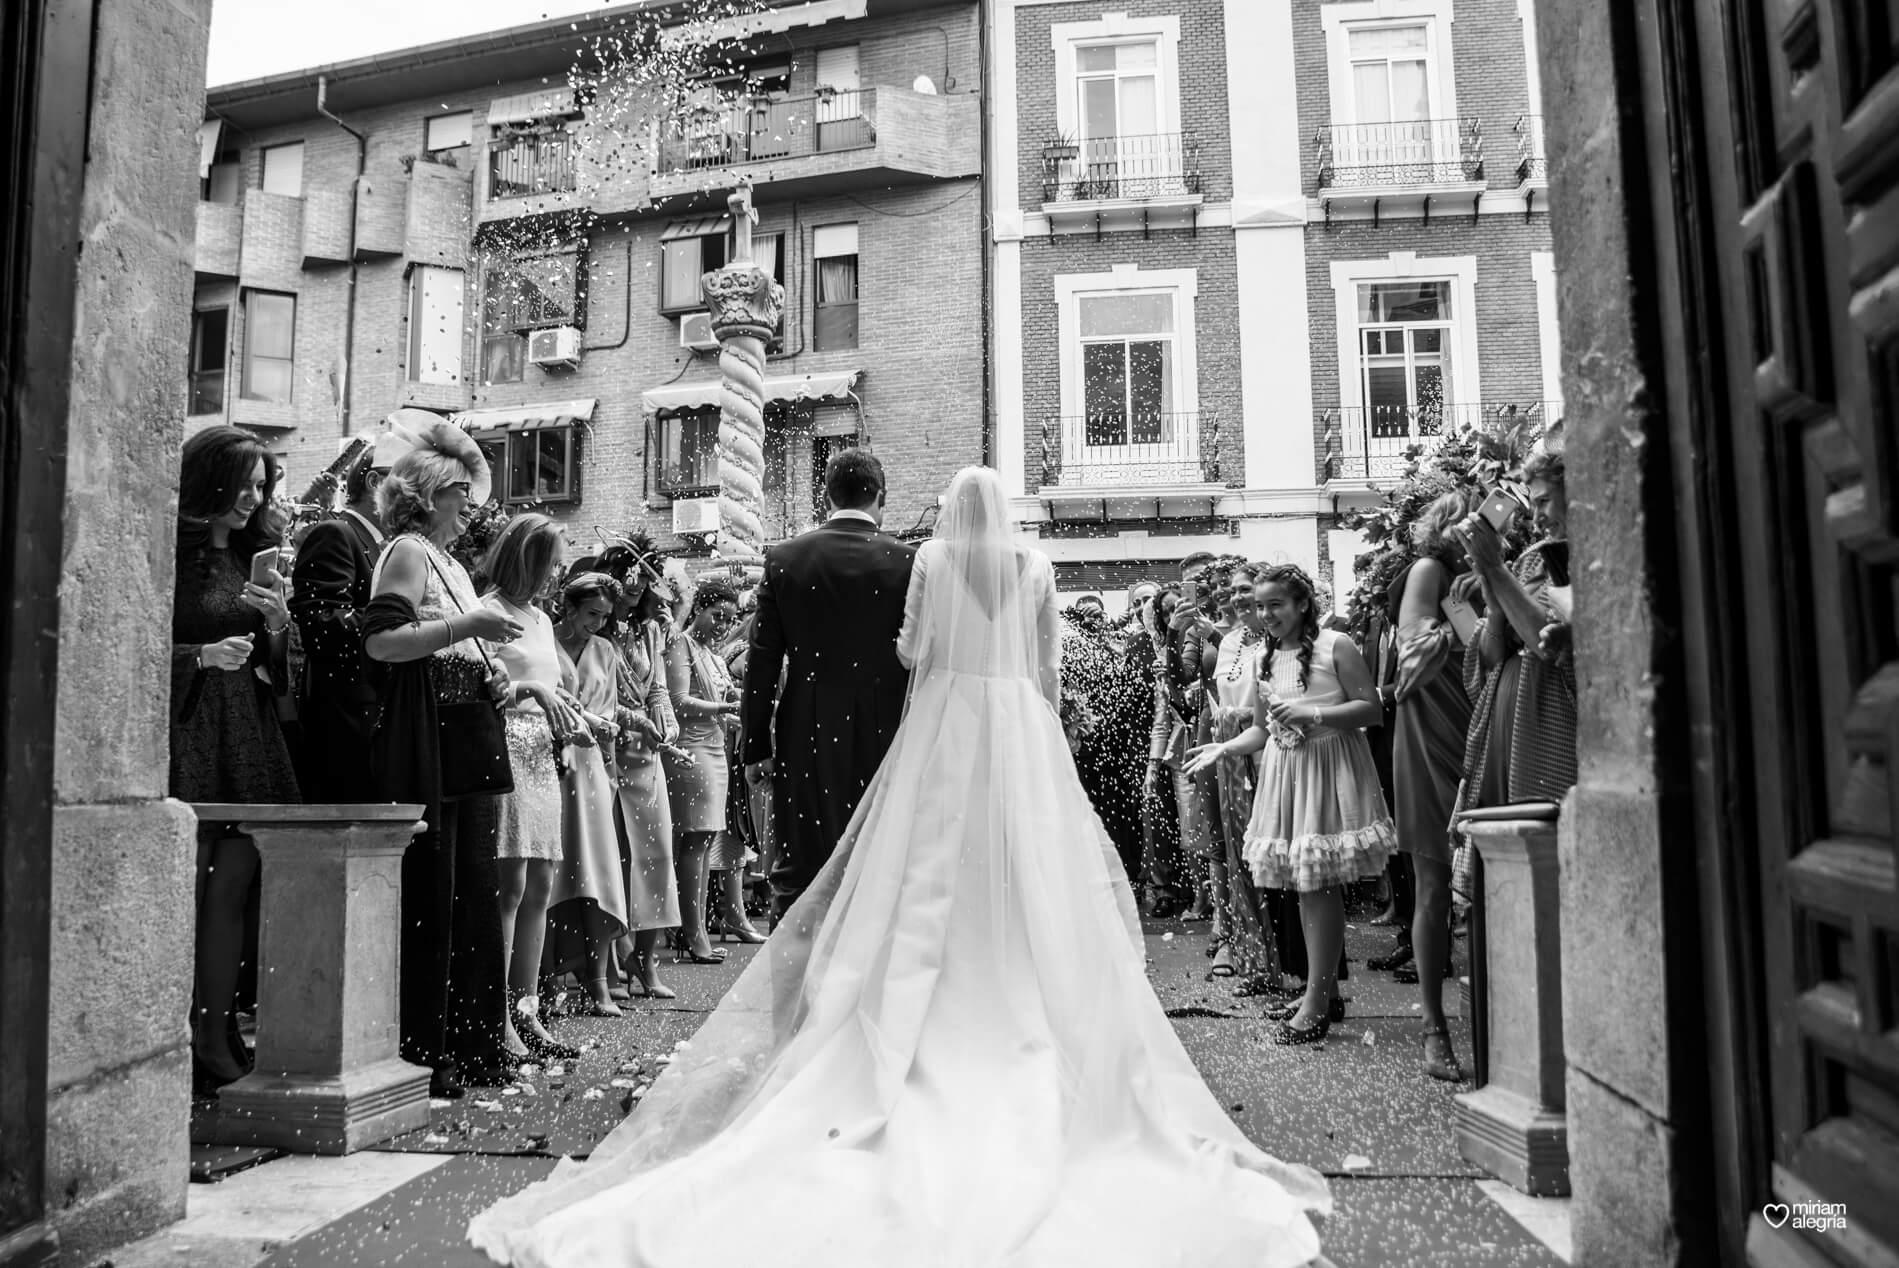 vestido-de-novia-paula-del-vas-miriam-alegria-fotografos-boda-murcia-184